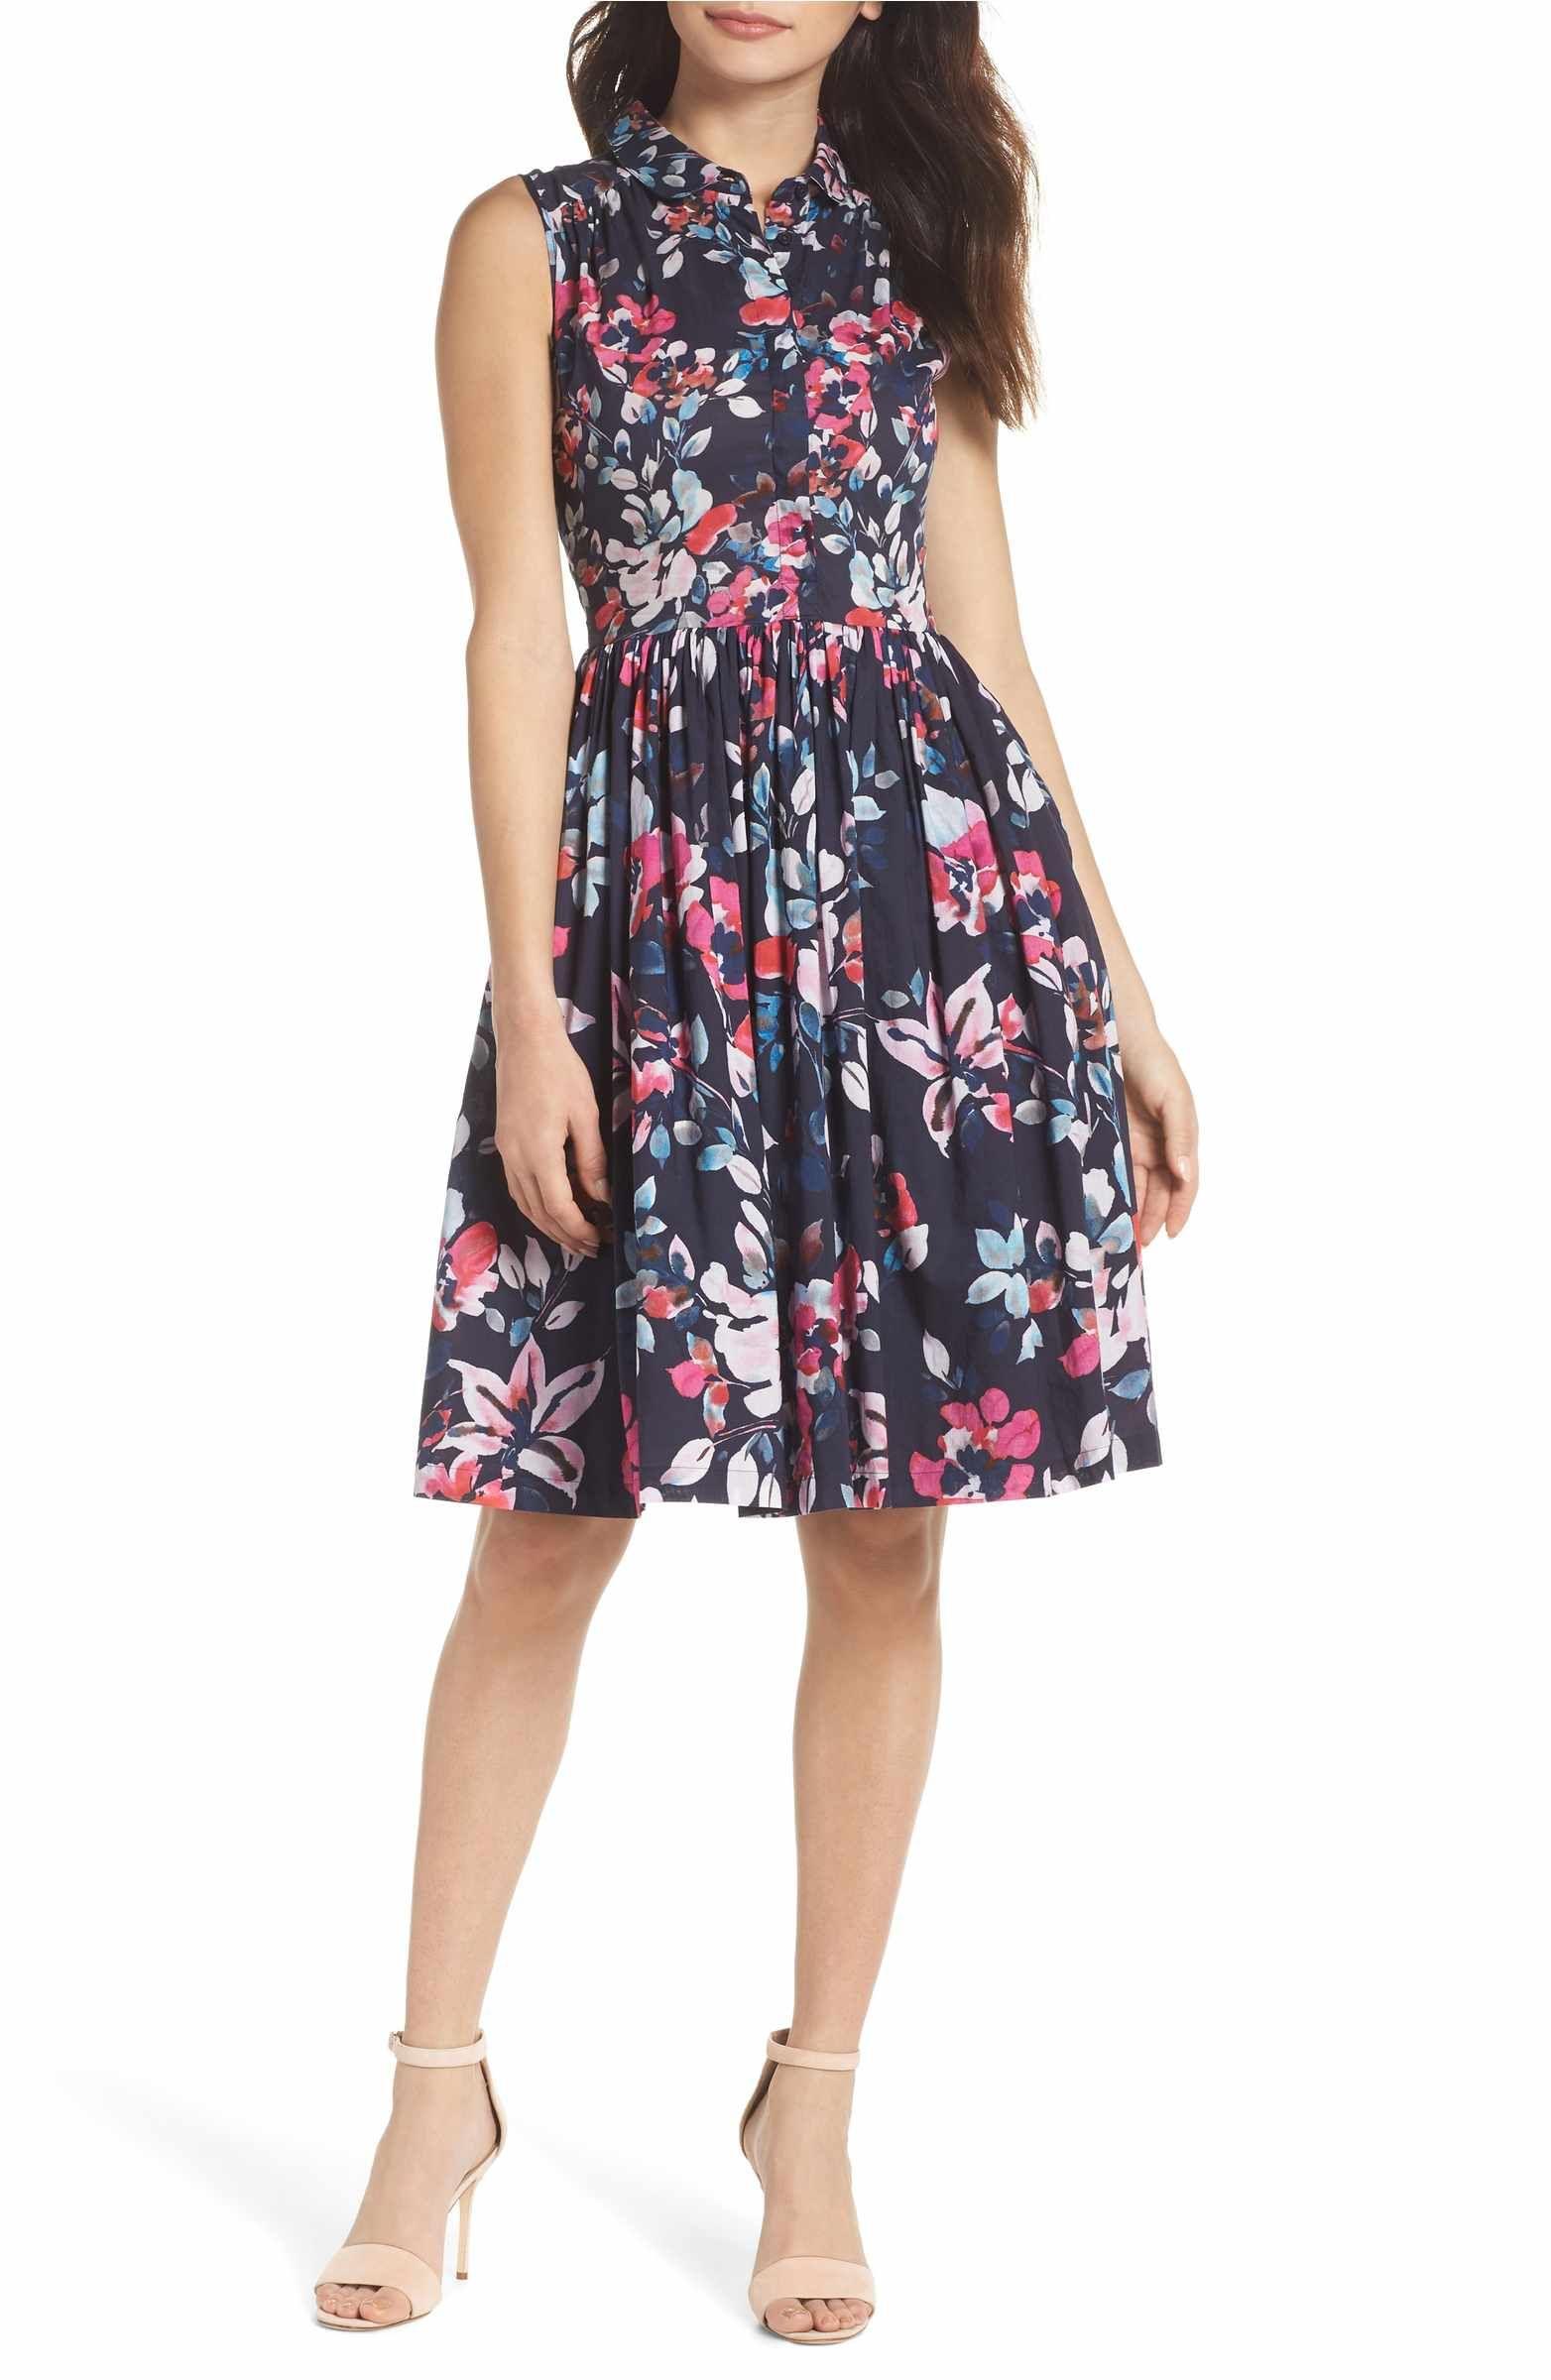 French Connection Linosa Cotton Voile Fit Flare Dress Nordstrom Fit Flare Dress Dresses Nordstrom Dresses [ 2400 x 1564 Pixel ]